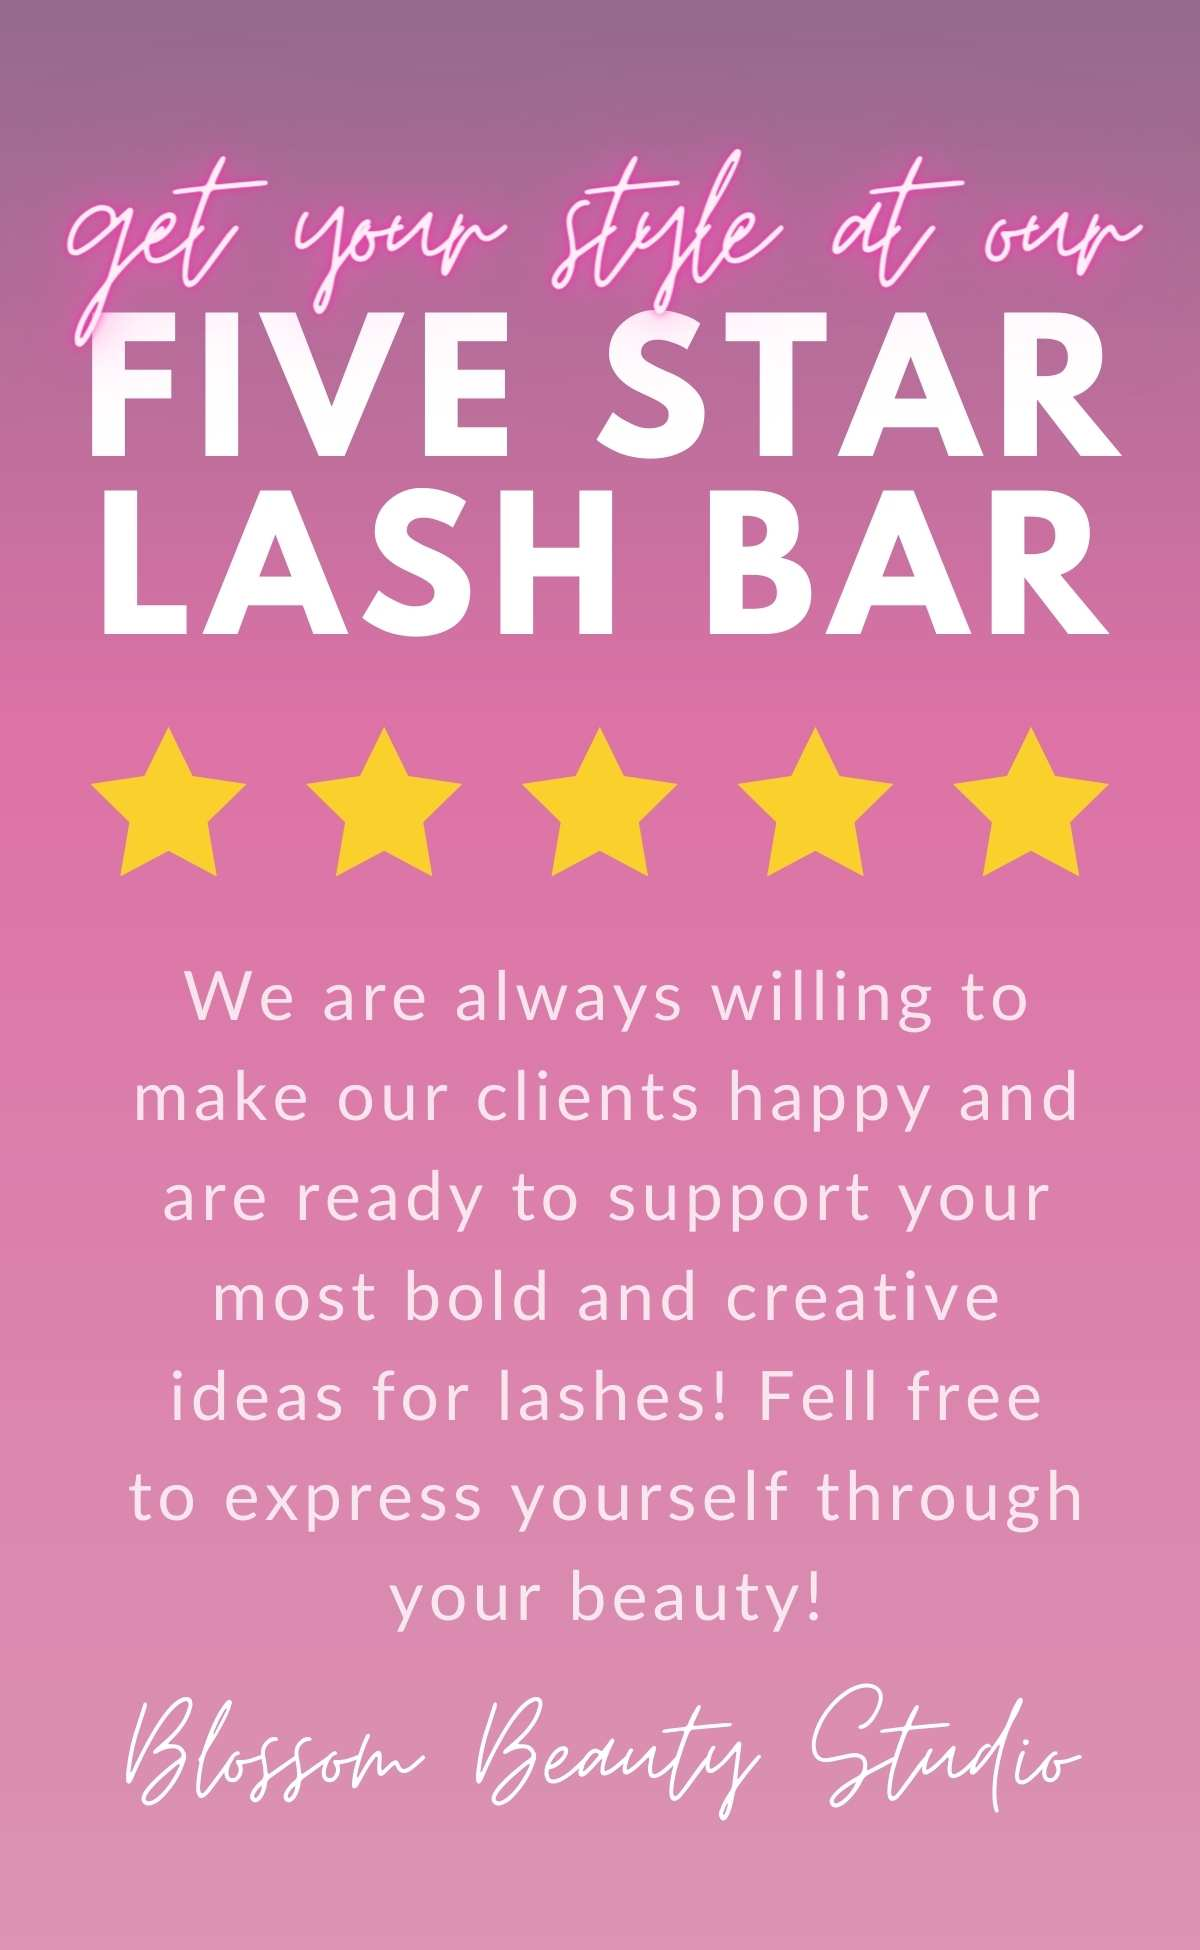 Blossom Beauty Studio website